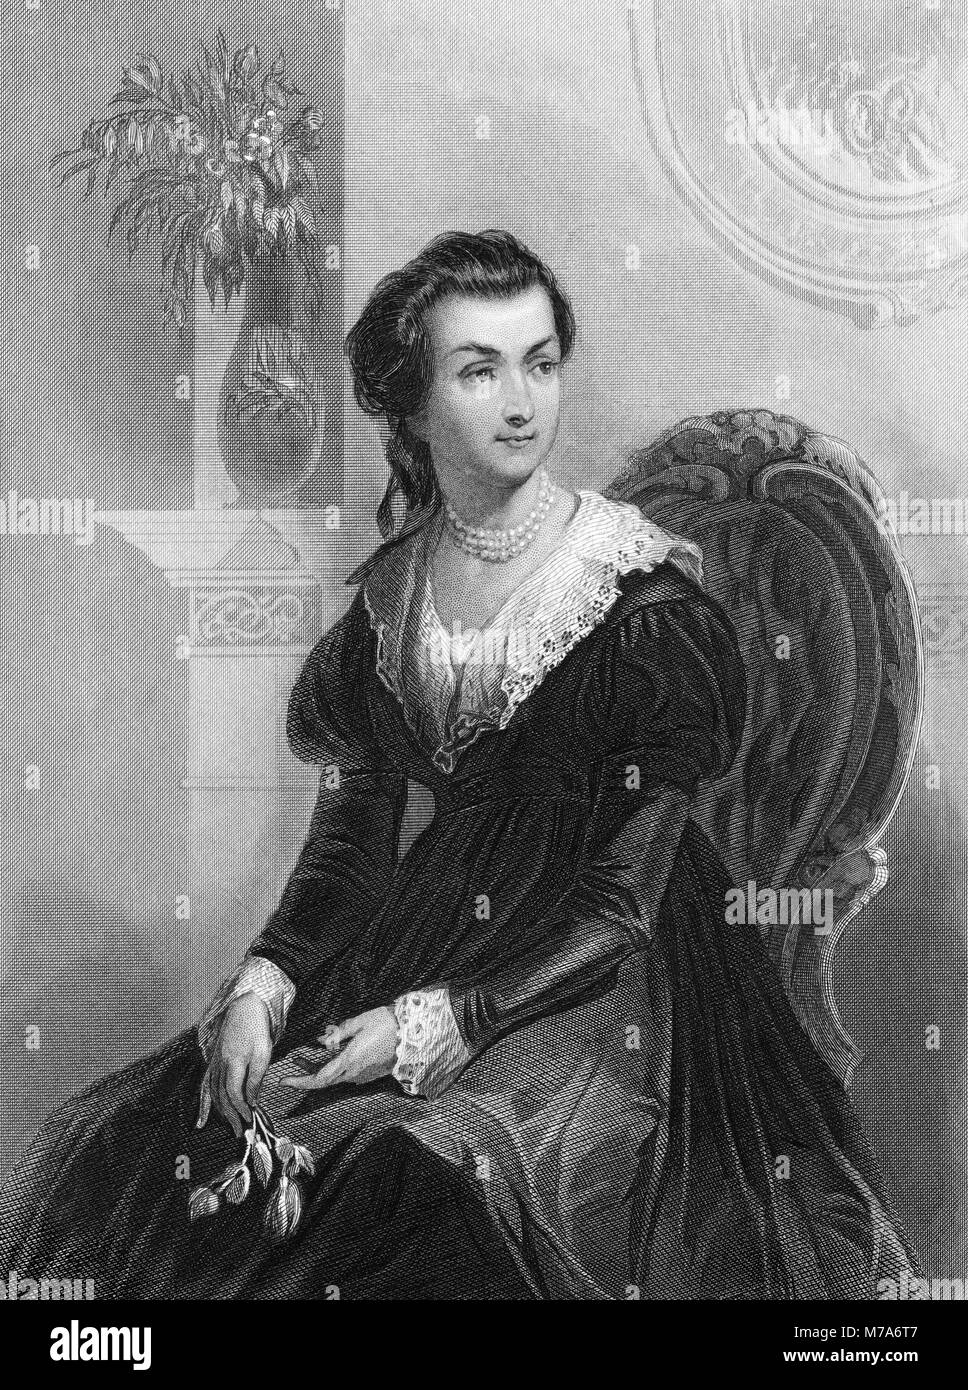 Abigail Adams (nee Smith: 1744-1818), wife of 2nd US President John Adams. Engraving by Christian Schussele, 1856. - Stock Image